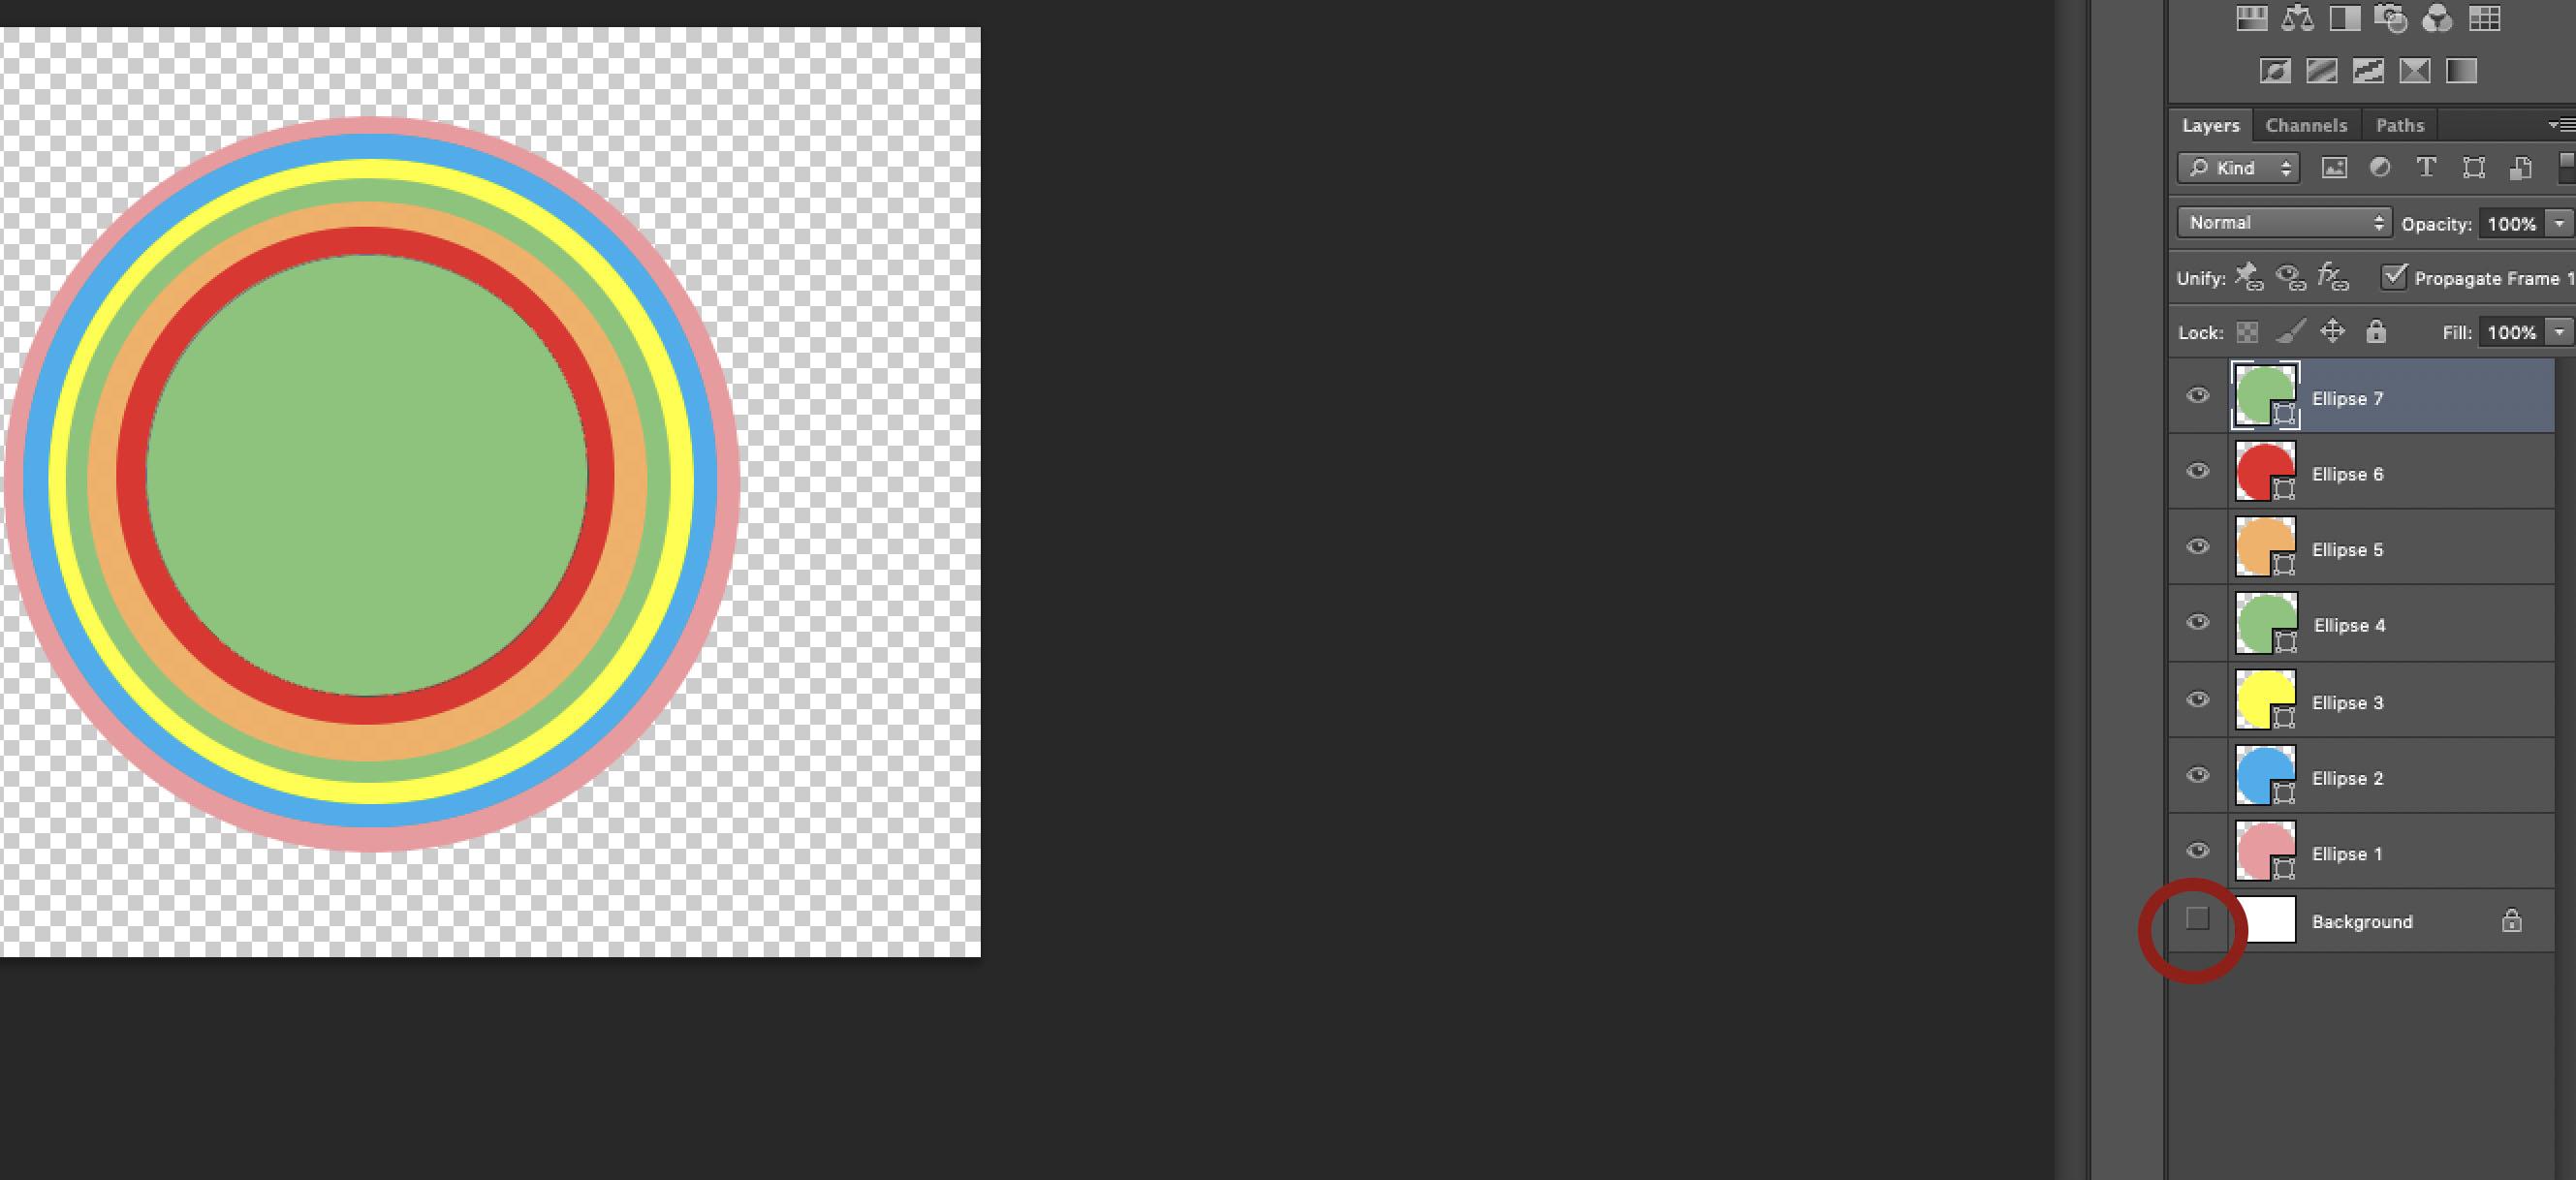 Rainbow in Adobe Photoshop